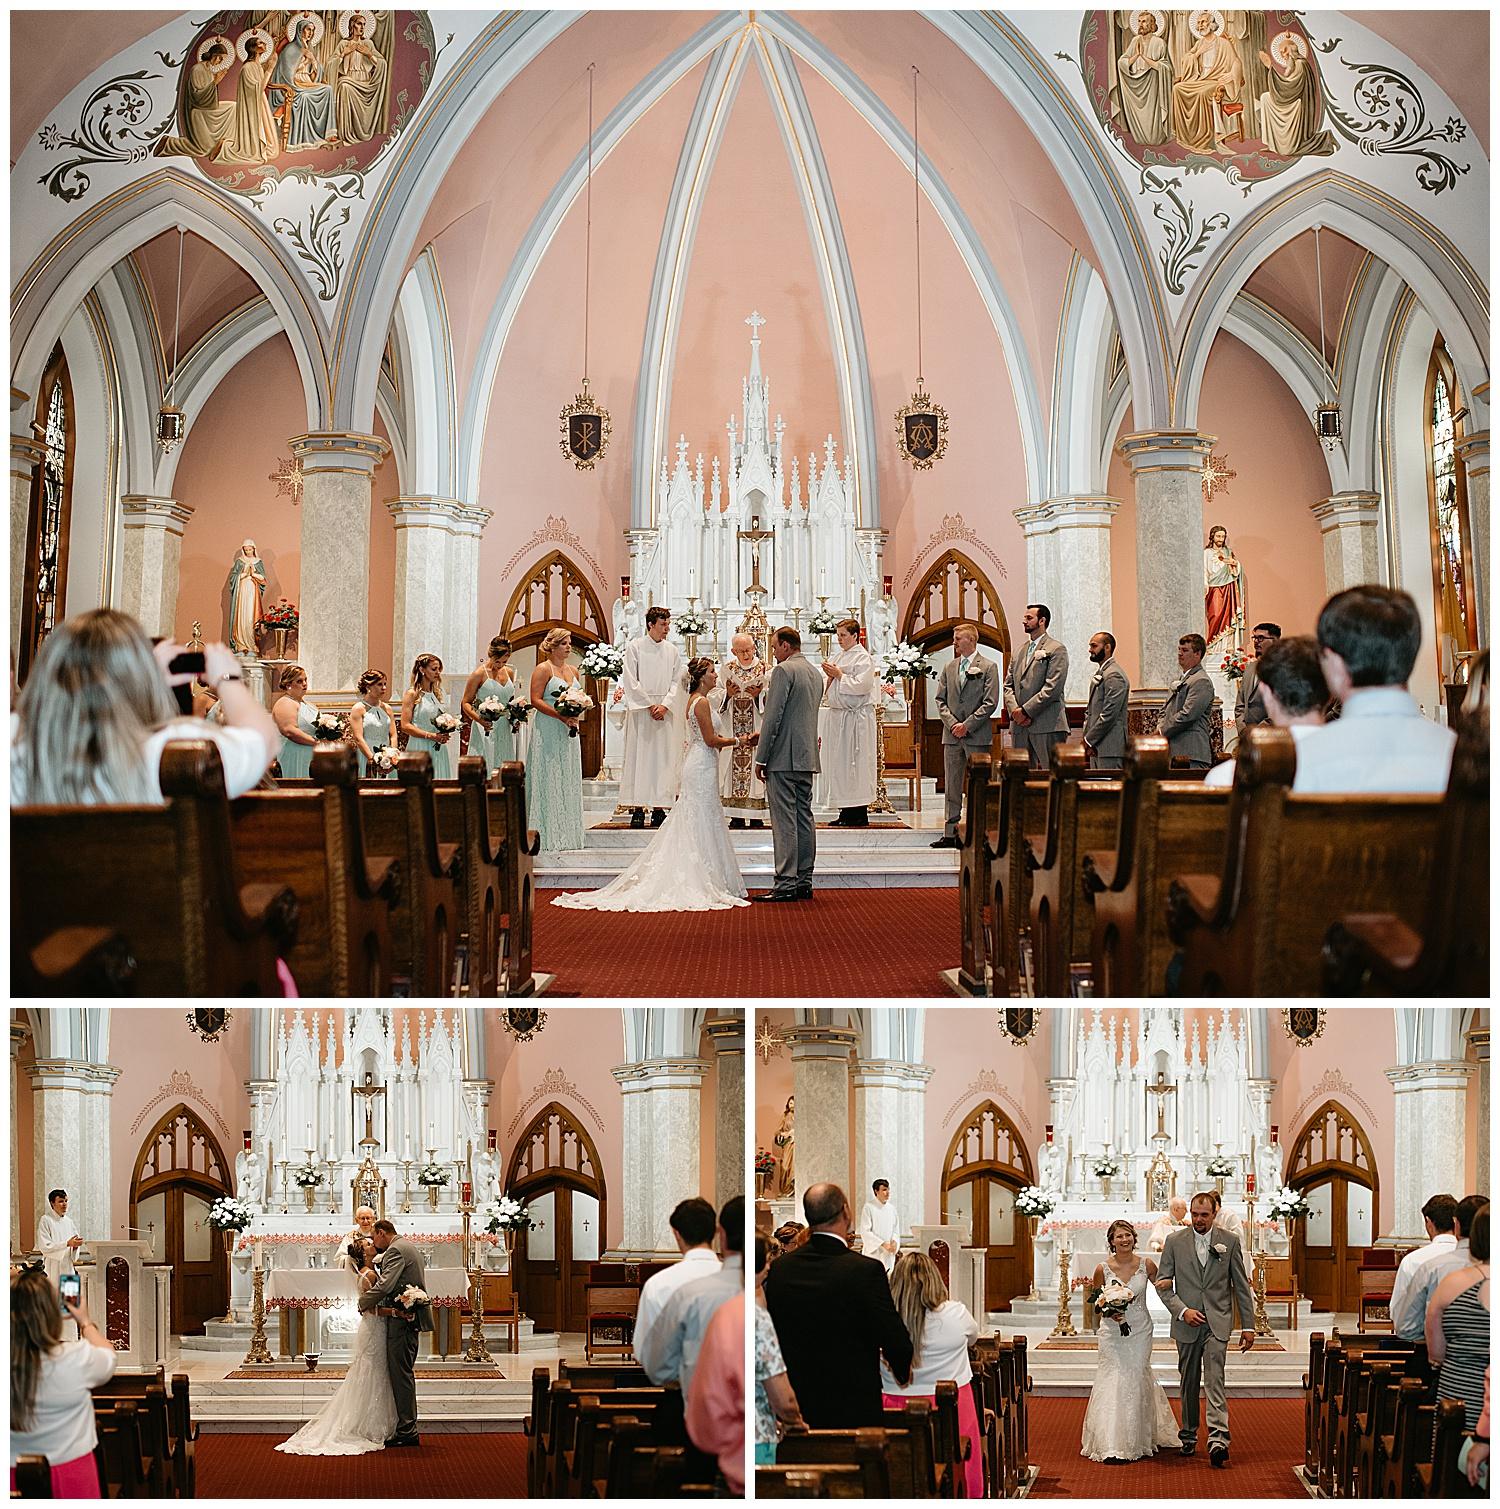 NEPA-Lehigh-Valley-Wedding-Photographer-at-Fountain-Springs-Country-Inn-Ashland-PA_0025.jpg